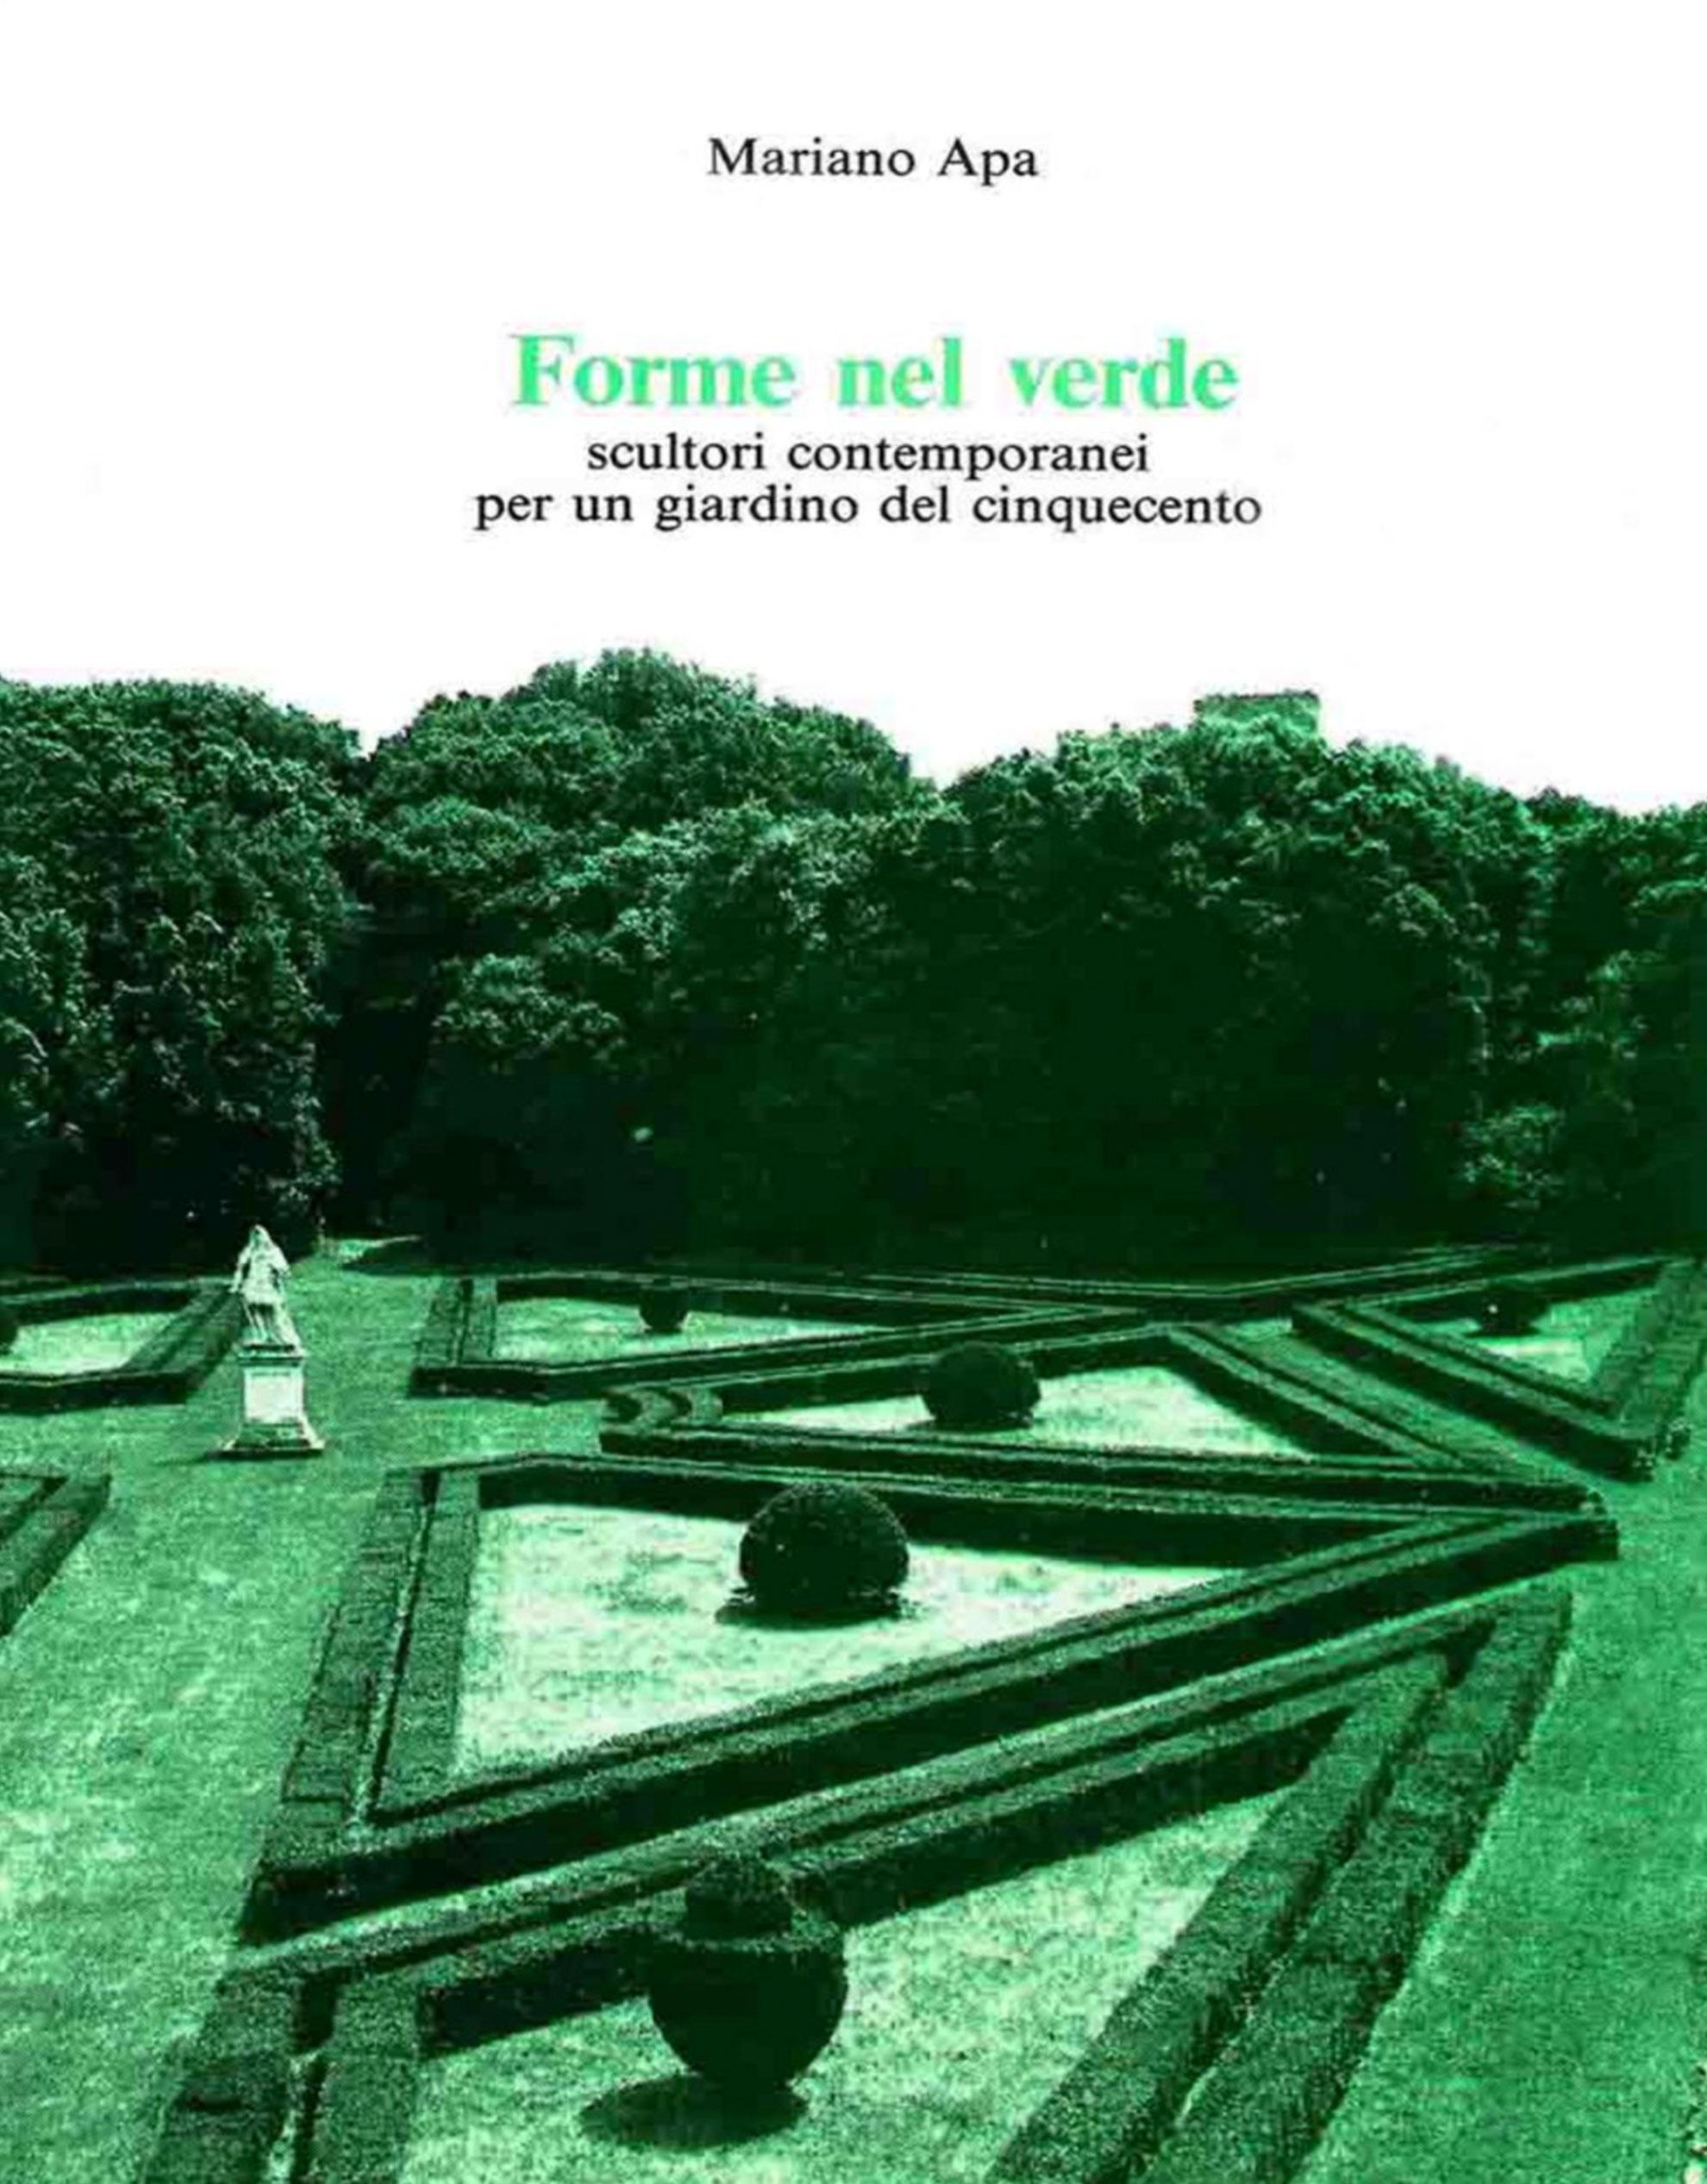 Catalogo Forme nel Verde 1985